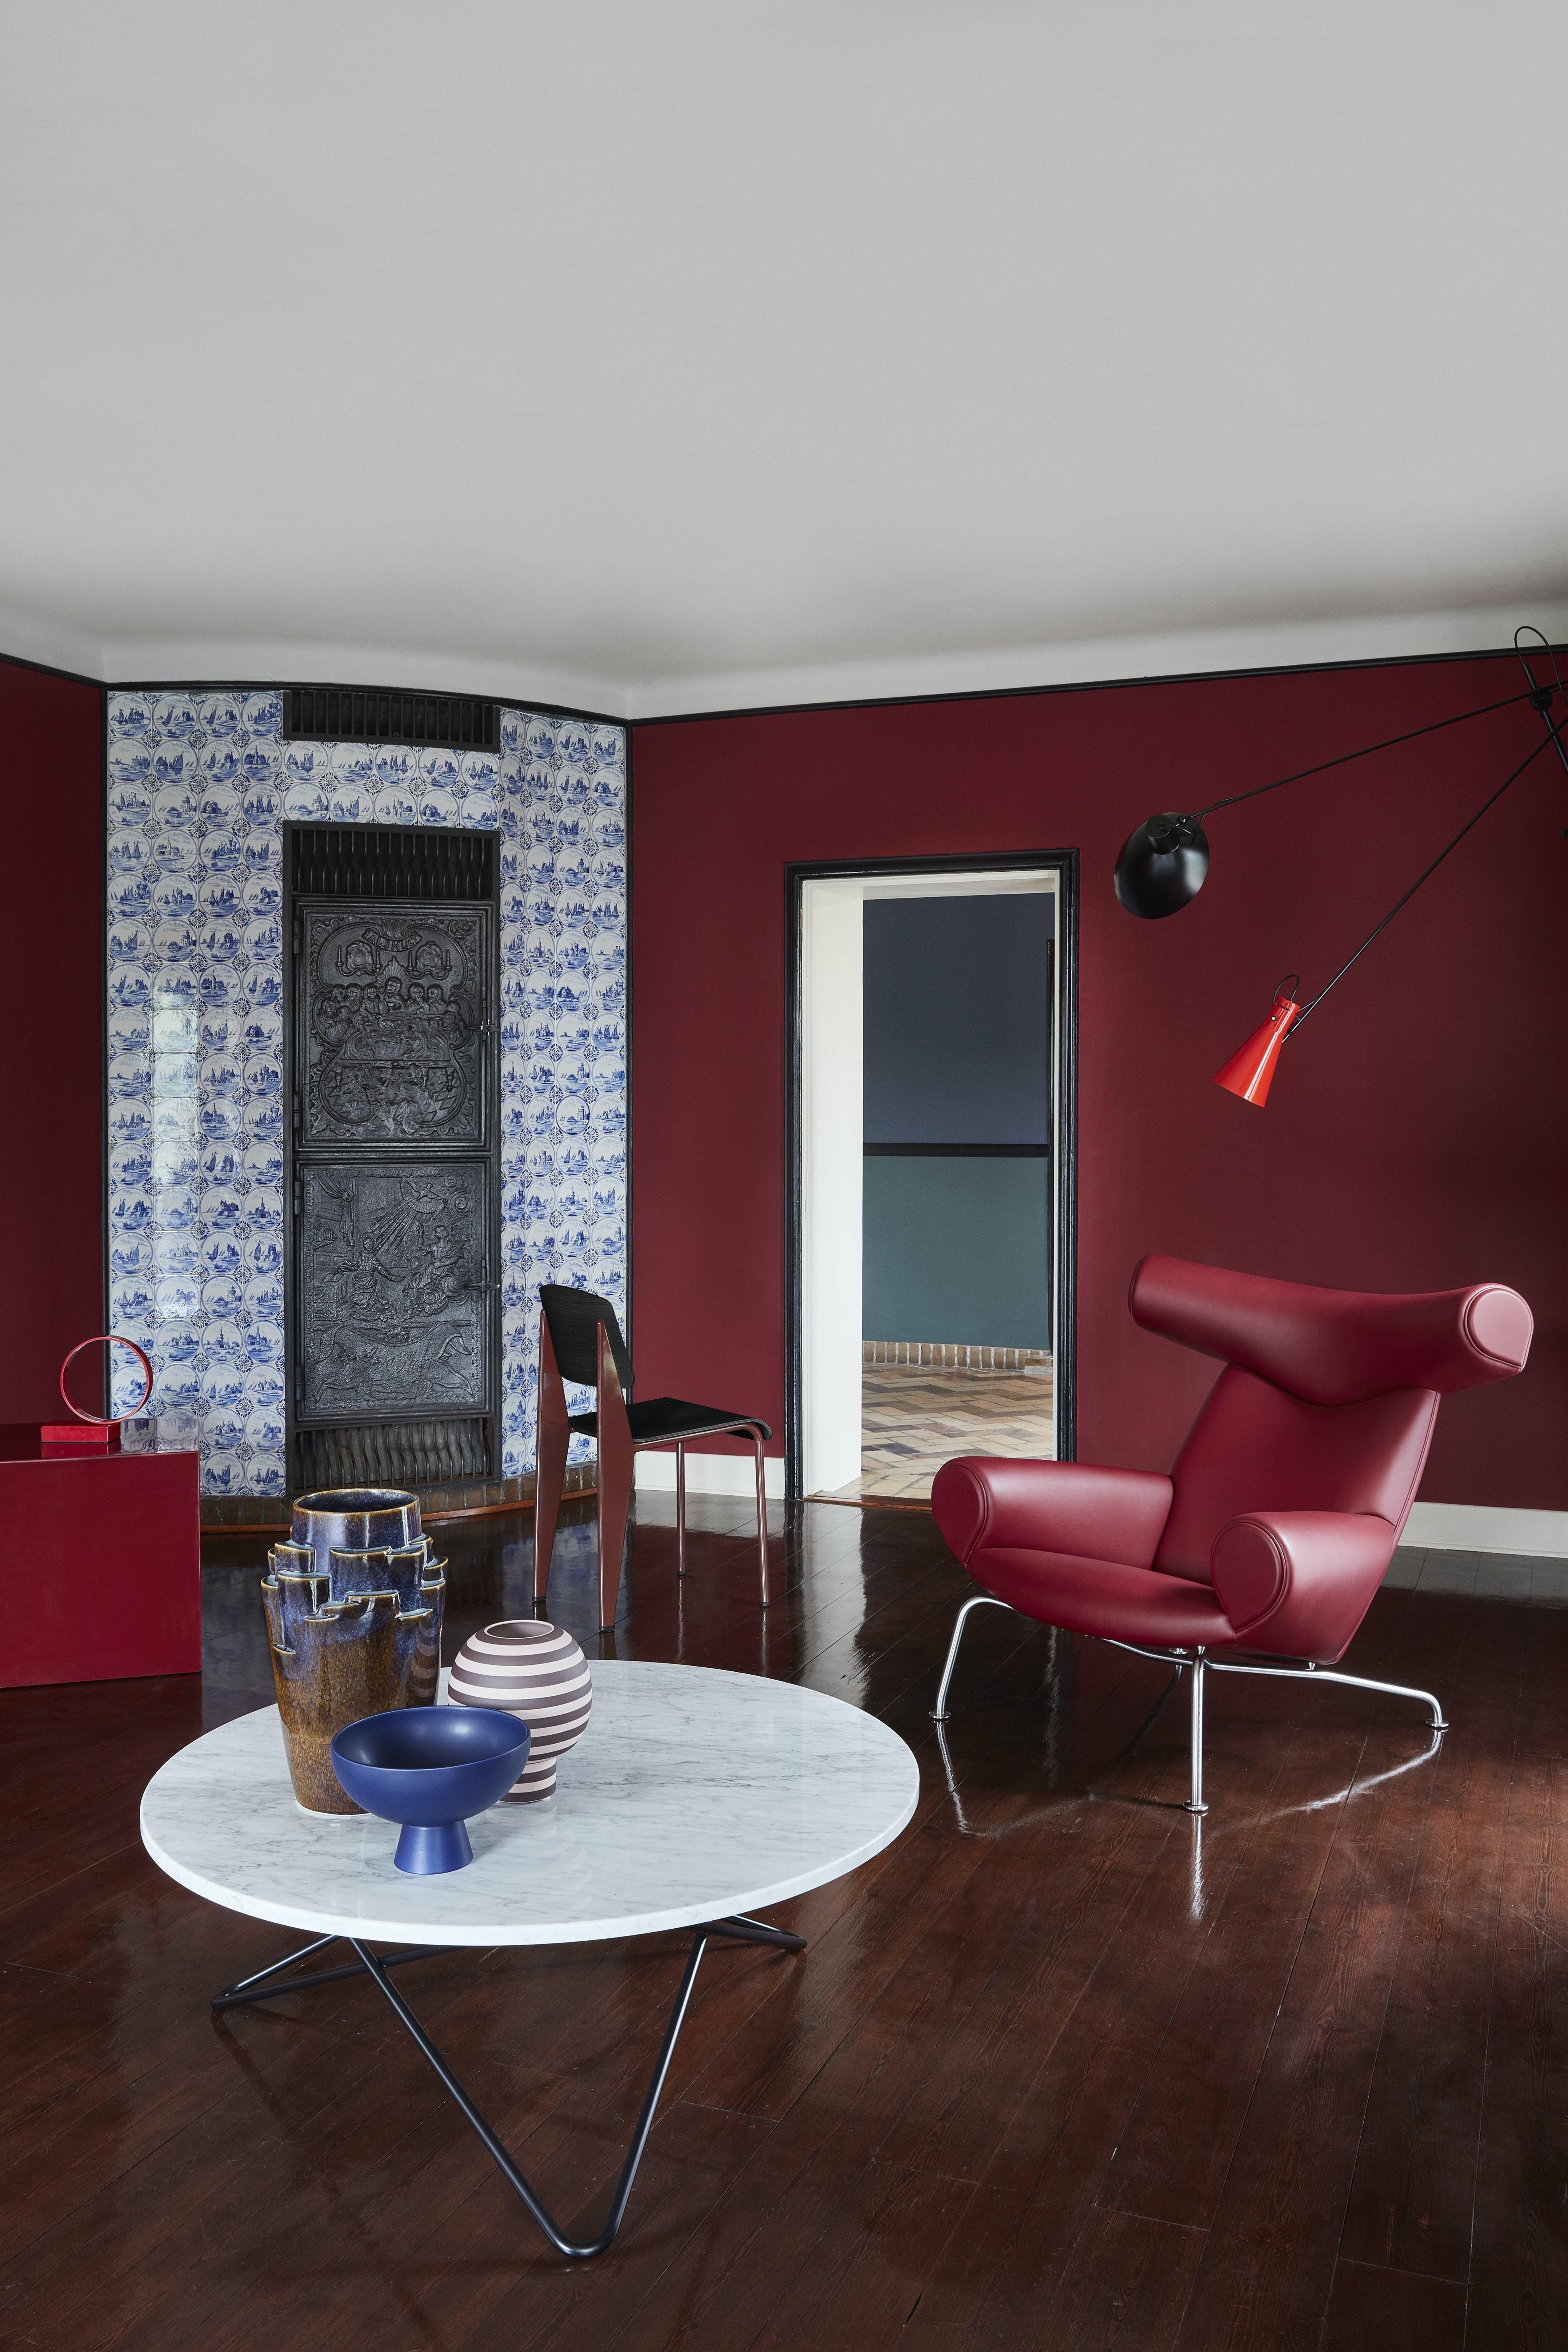 kay fisker hus styling bo bedre sofabord stol vase keramikskål bordlampe